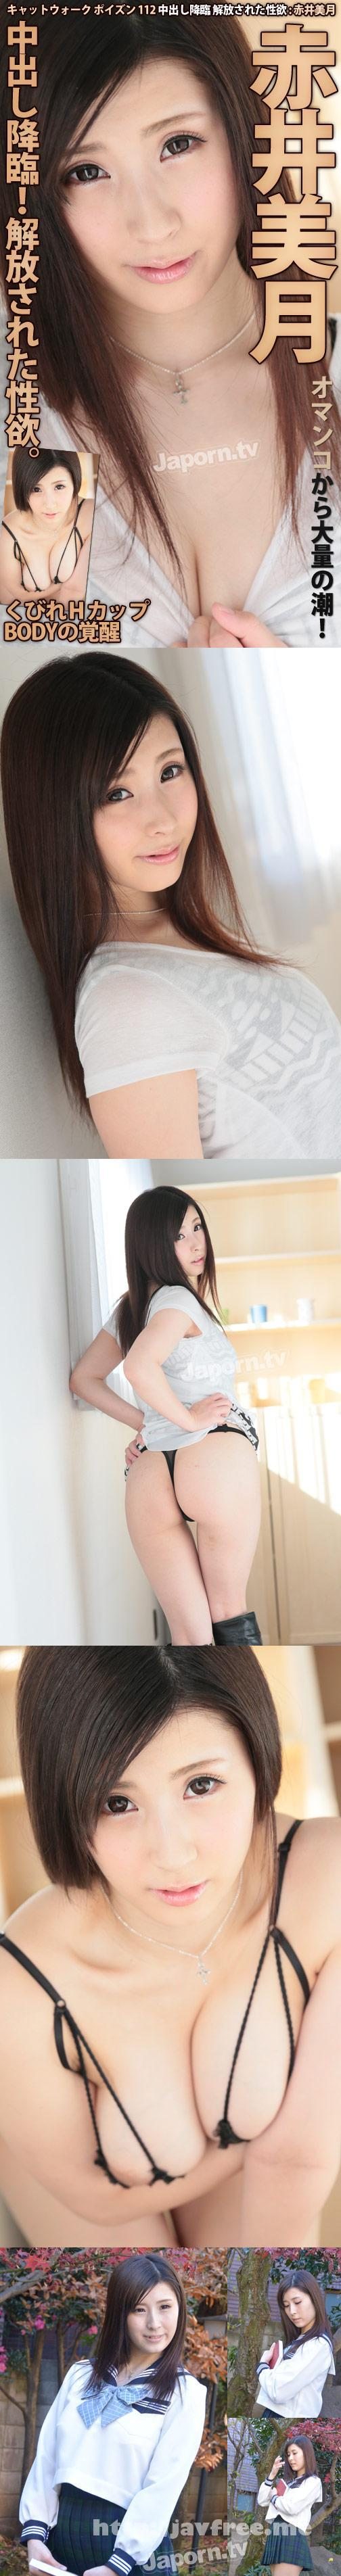 [CWP 112] キャットウォーク ポイズン 112 中出し降臨 解放された性欲 : 赤井美月 赤井美月 Mitsuki Akai CWP